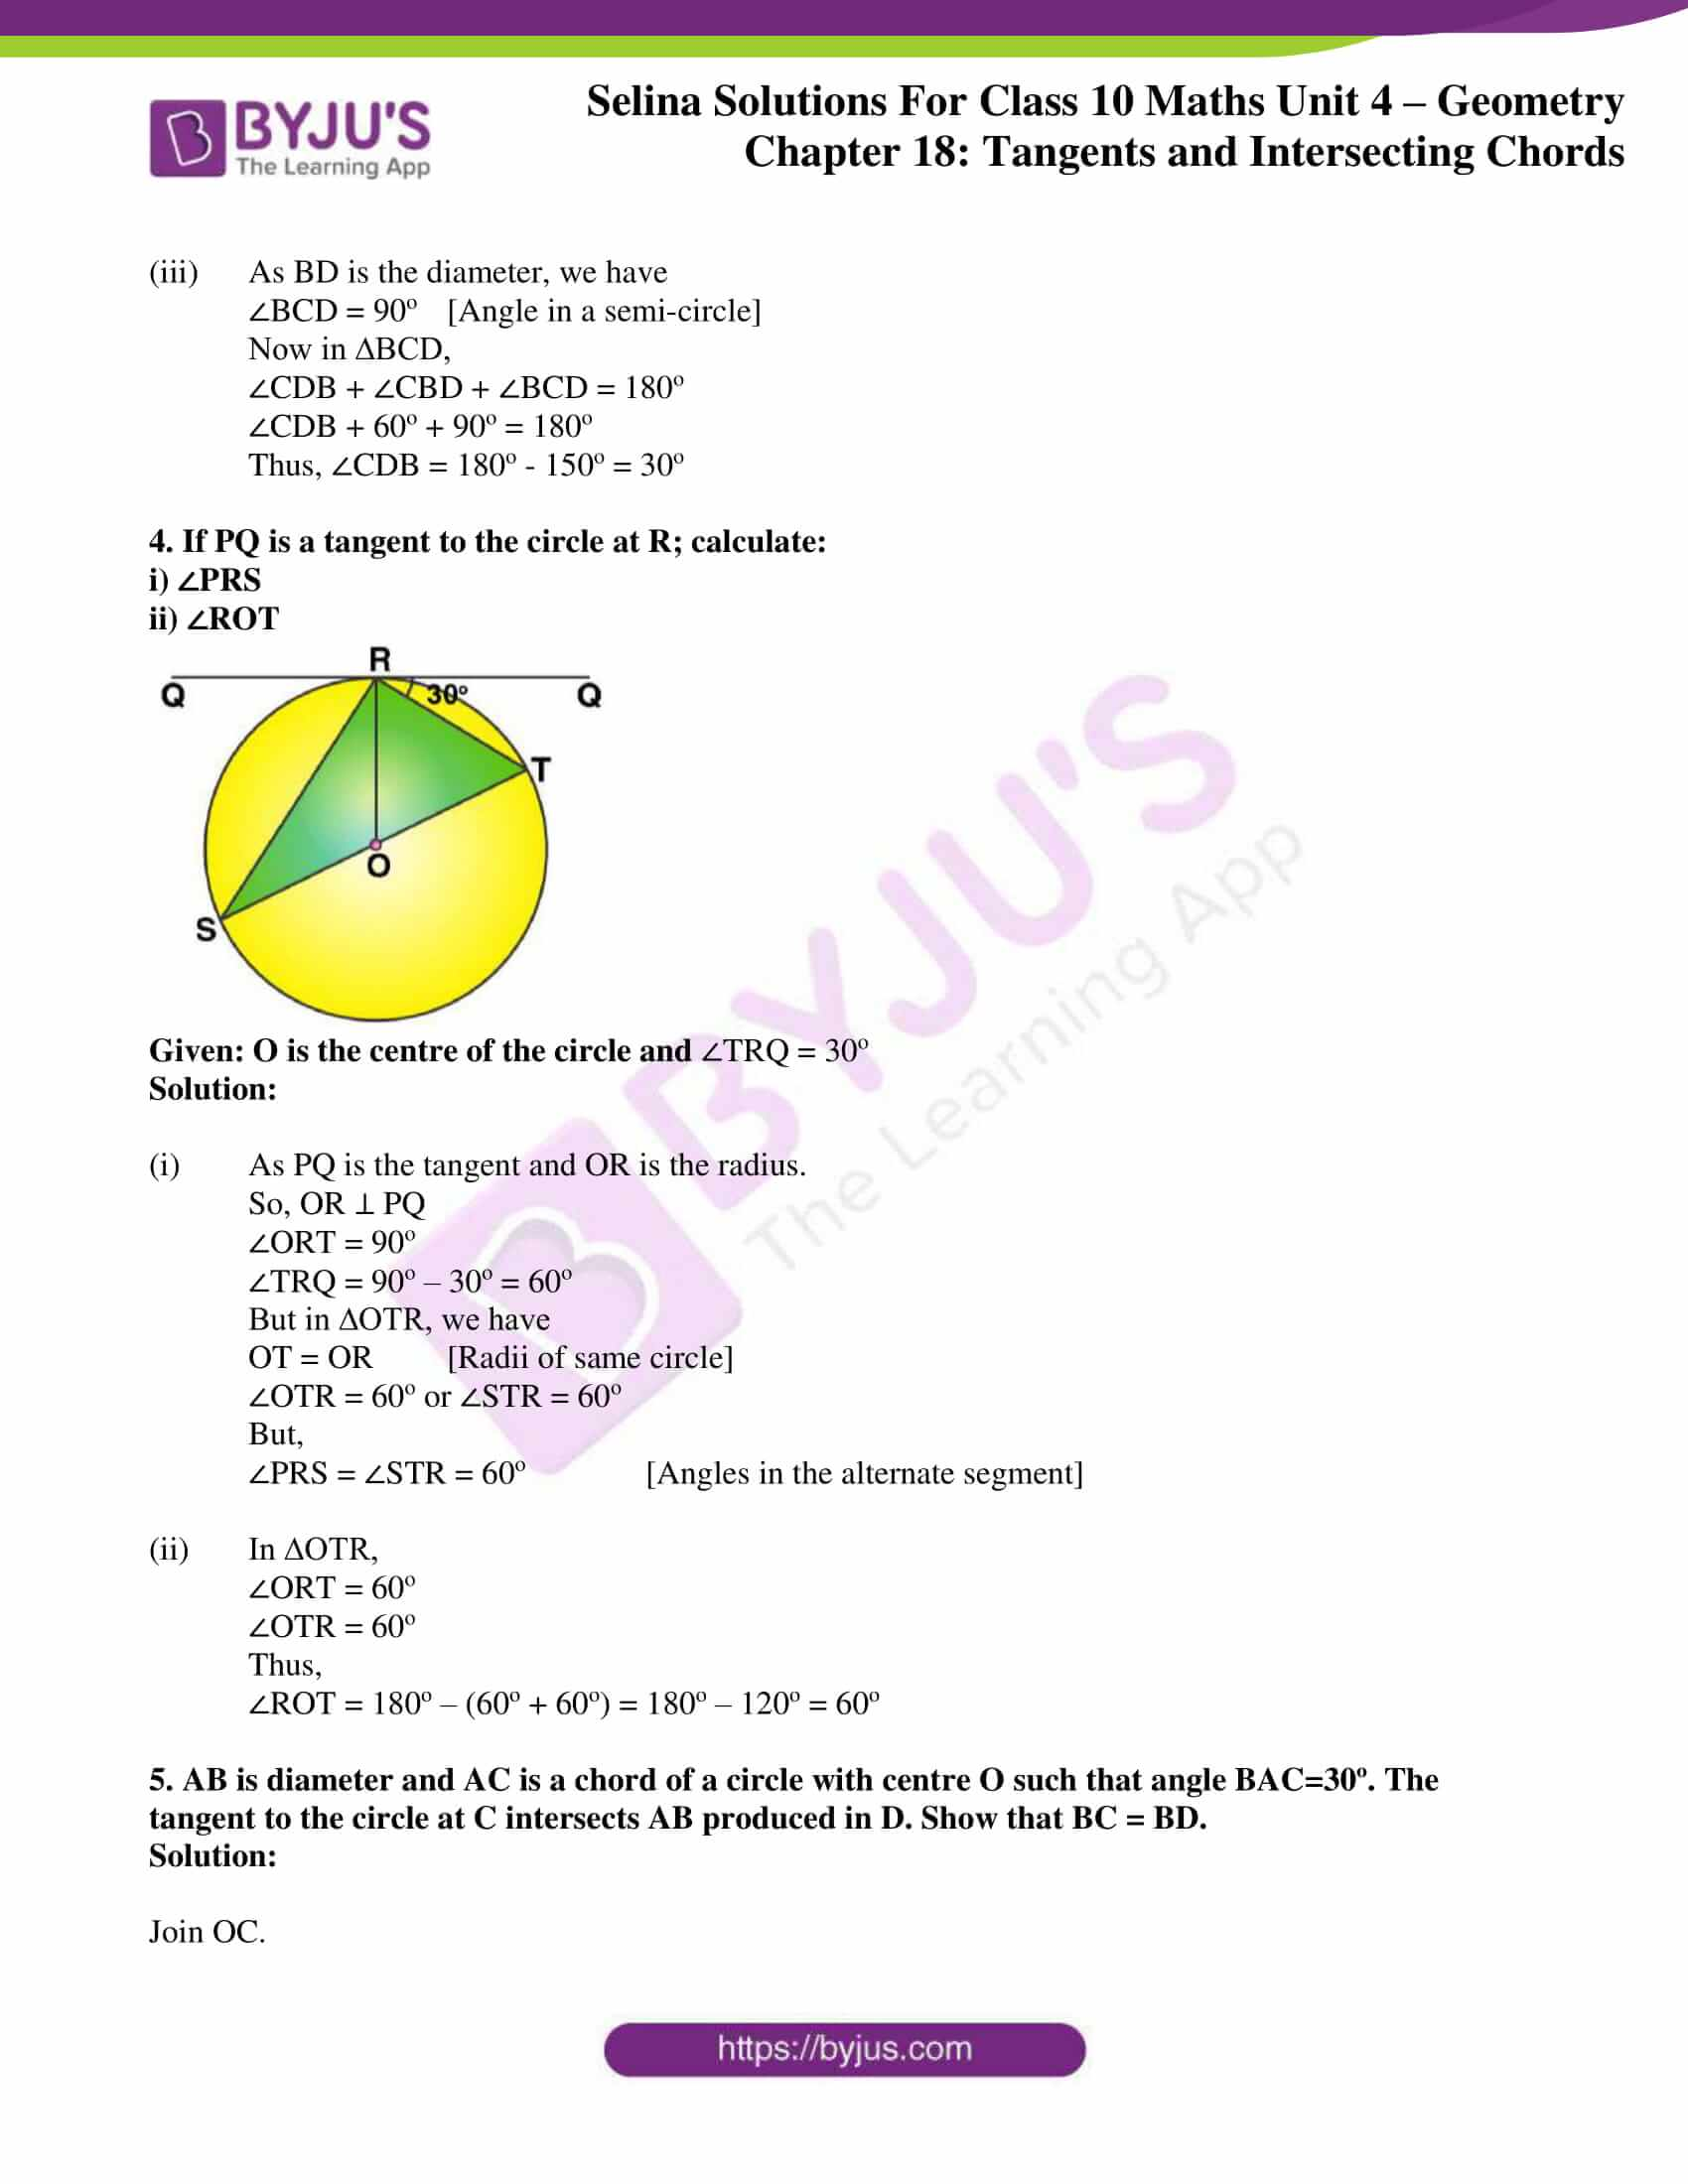 selina-sol-maths-class-10-ch-18-ex-b-3